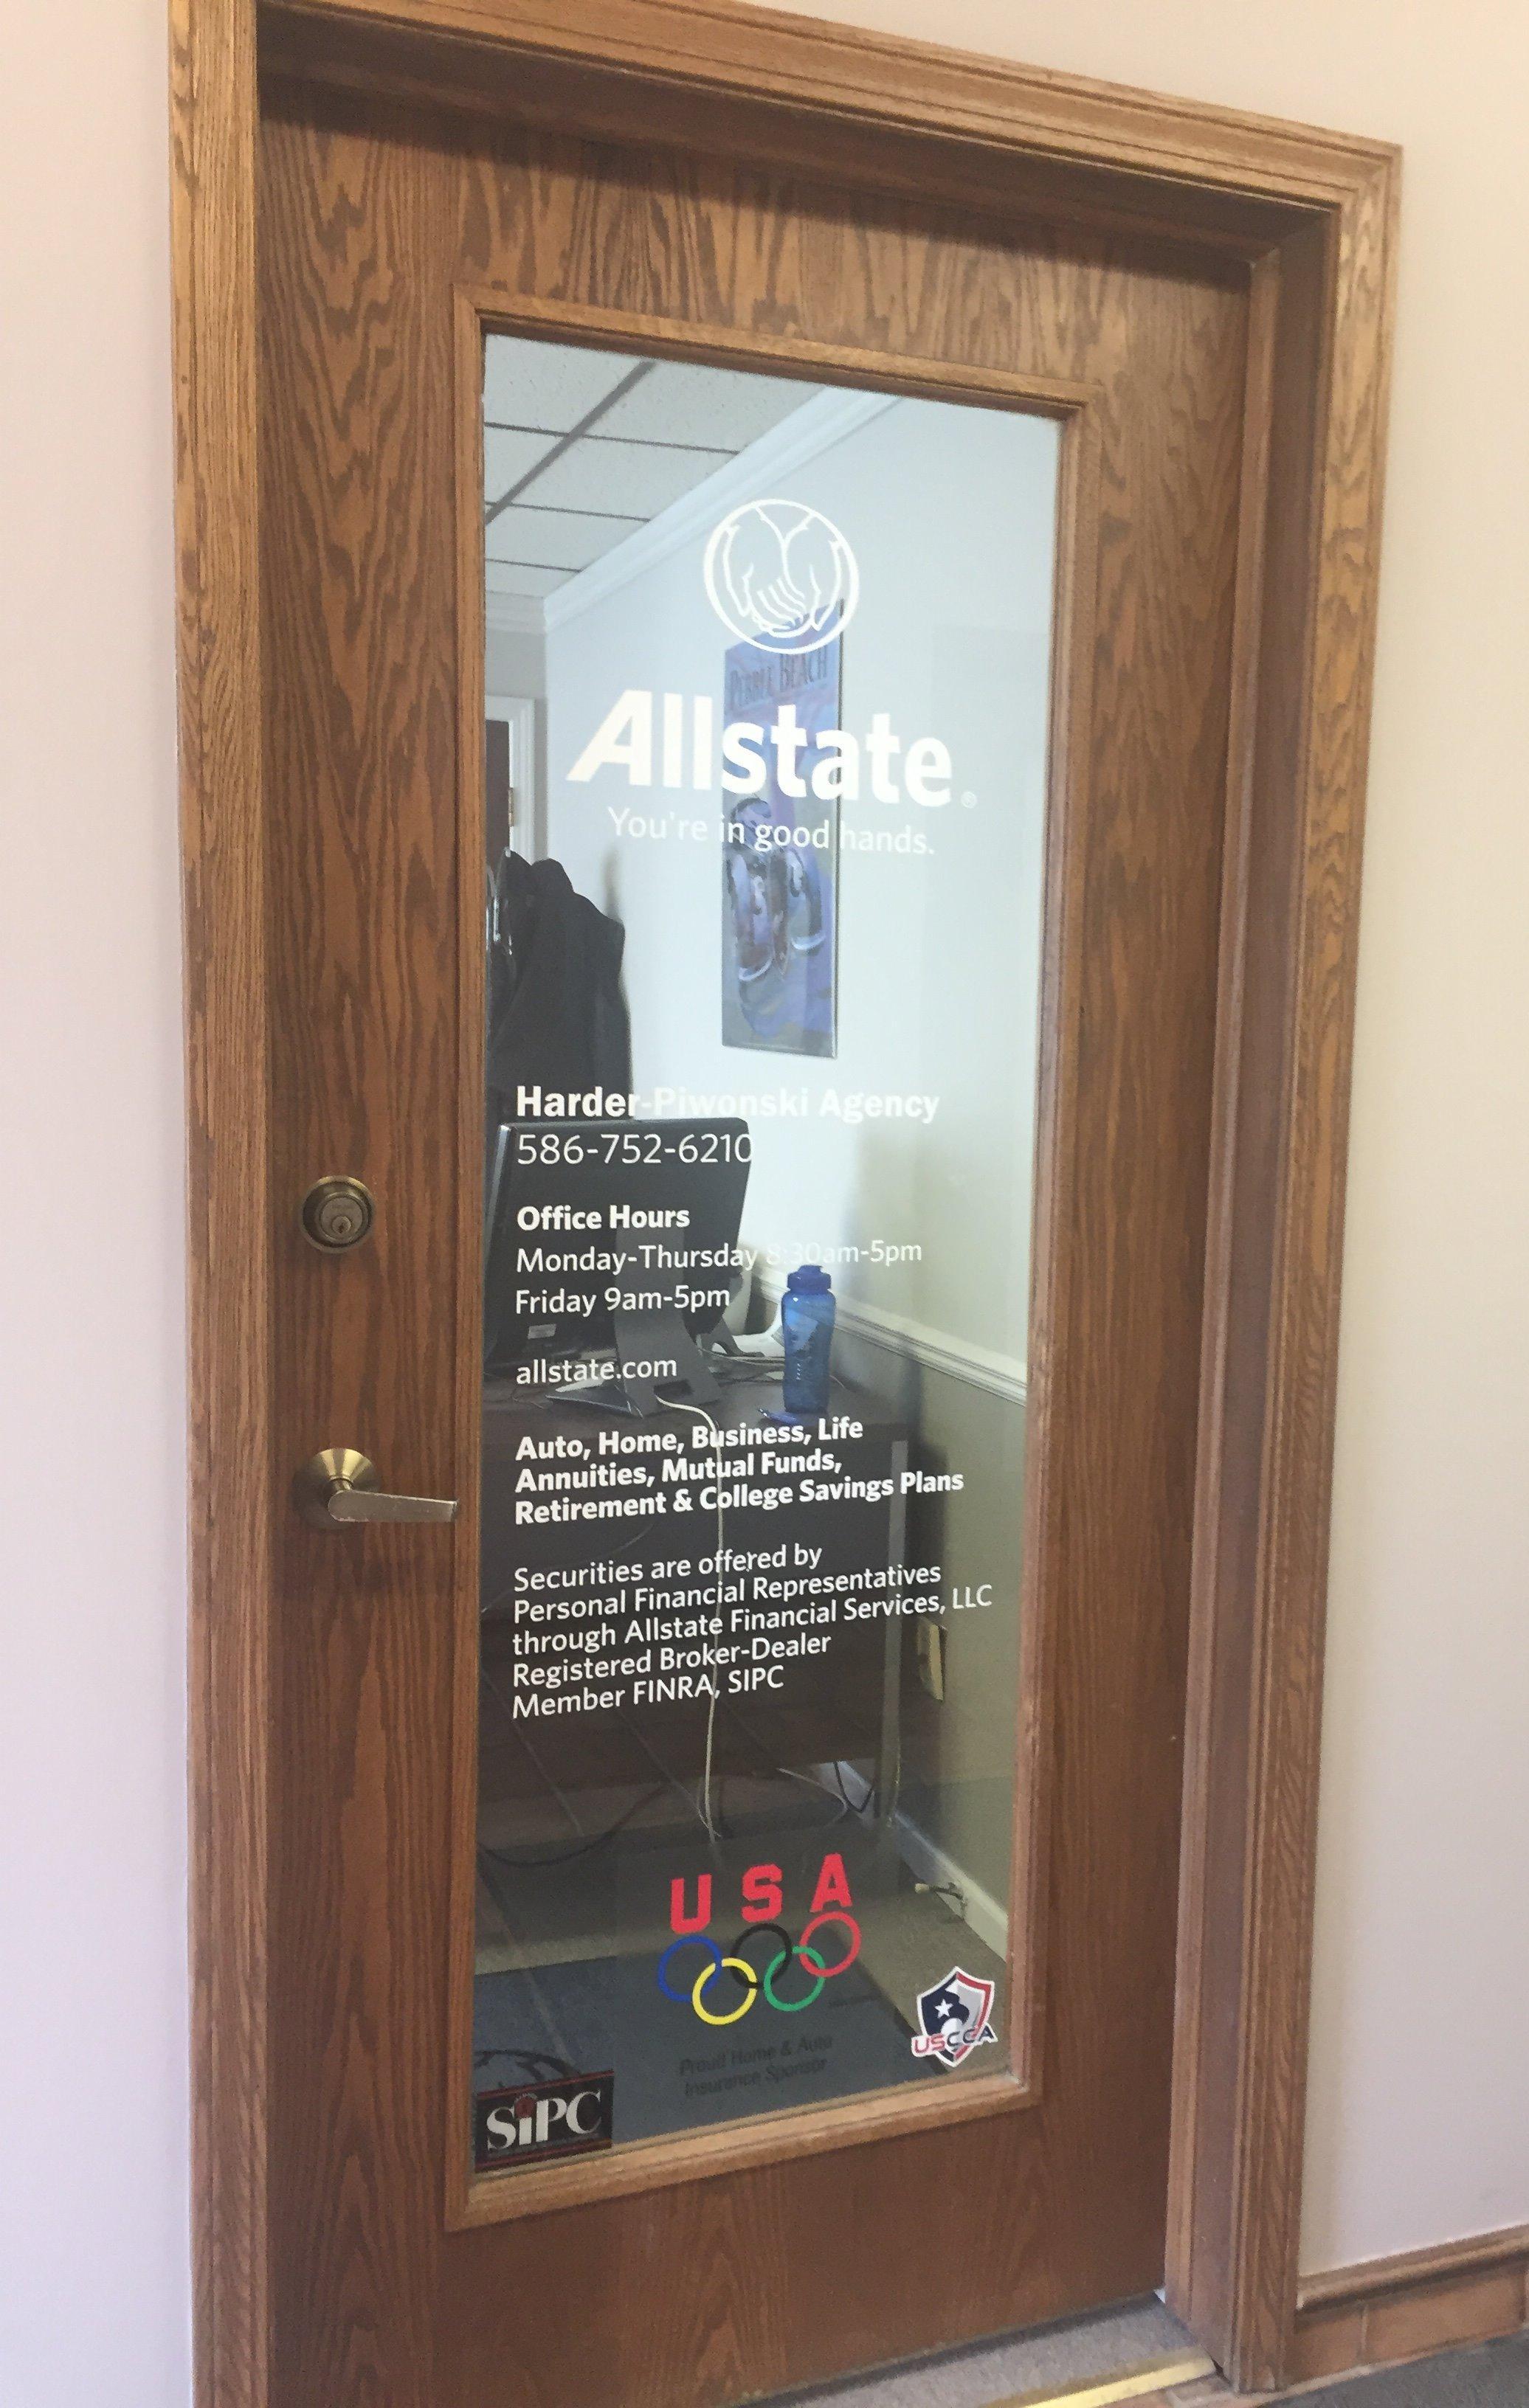 Chuck Harder: Allstate Insurance image 3